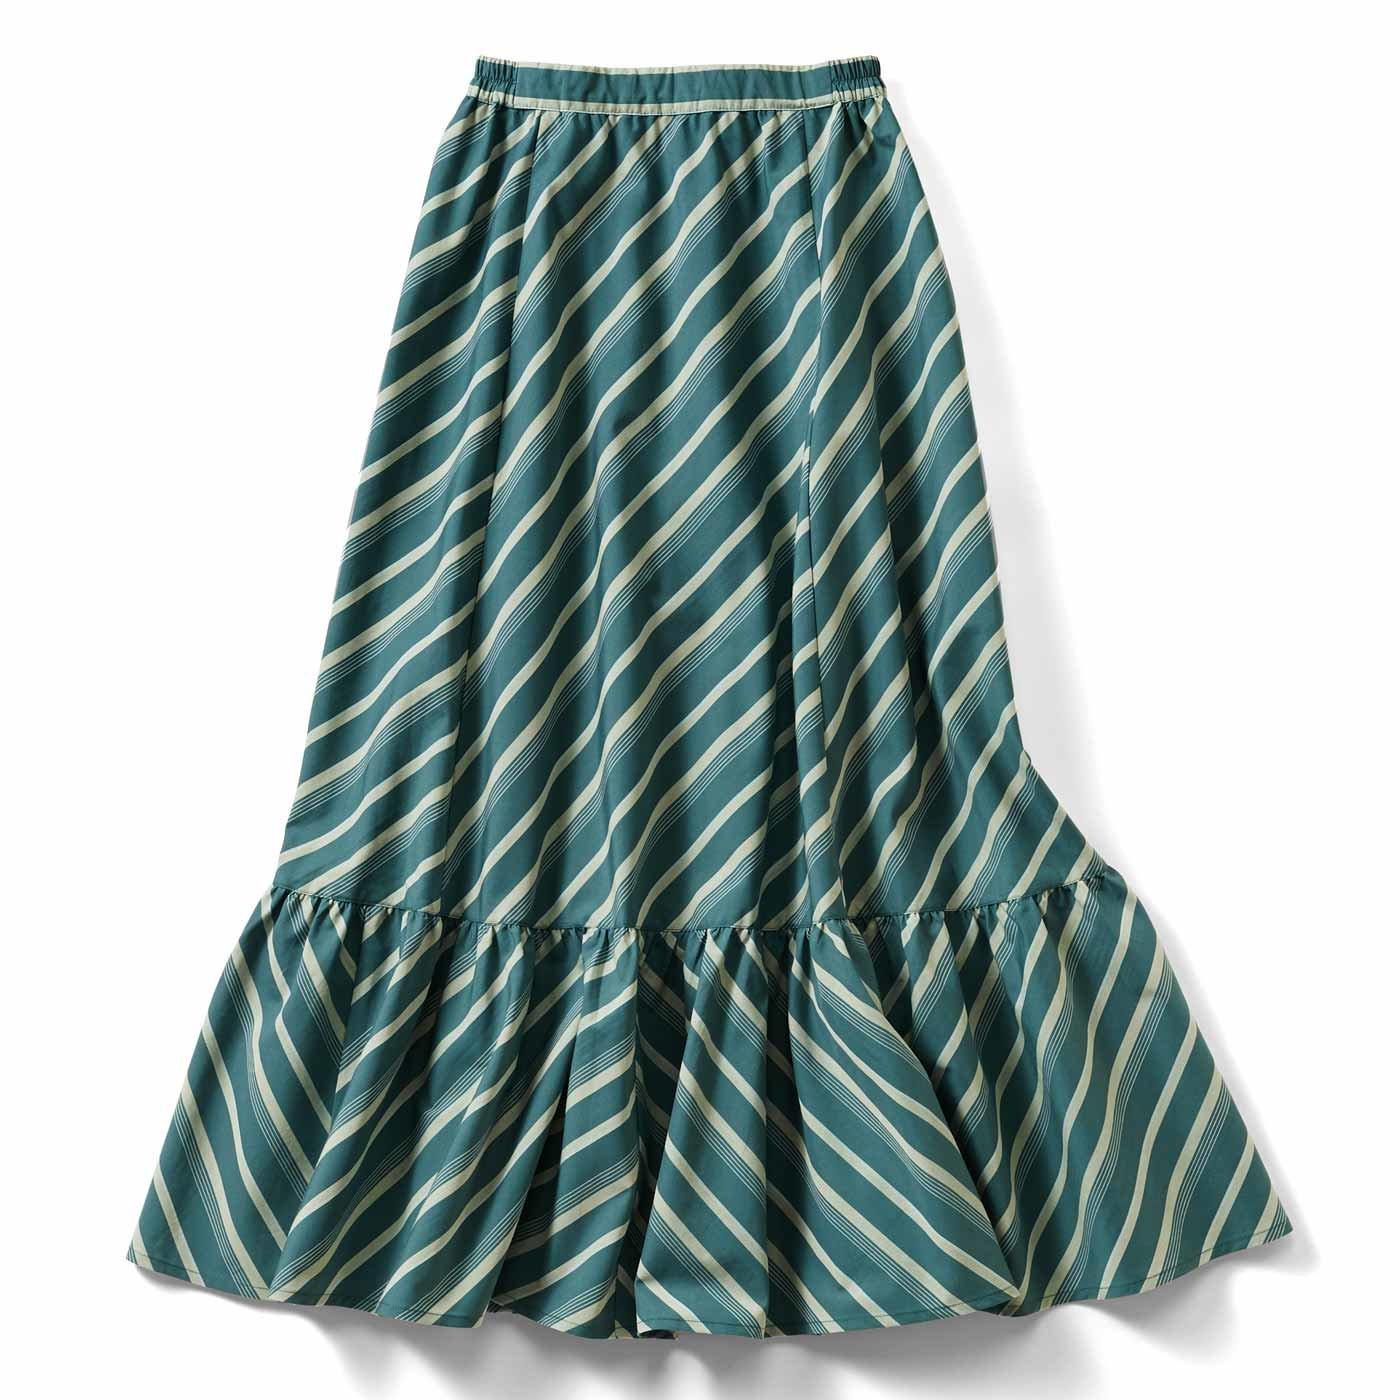 IEDIT[イディット] ストライプ柄切り替えスカート〈グリーン〉